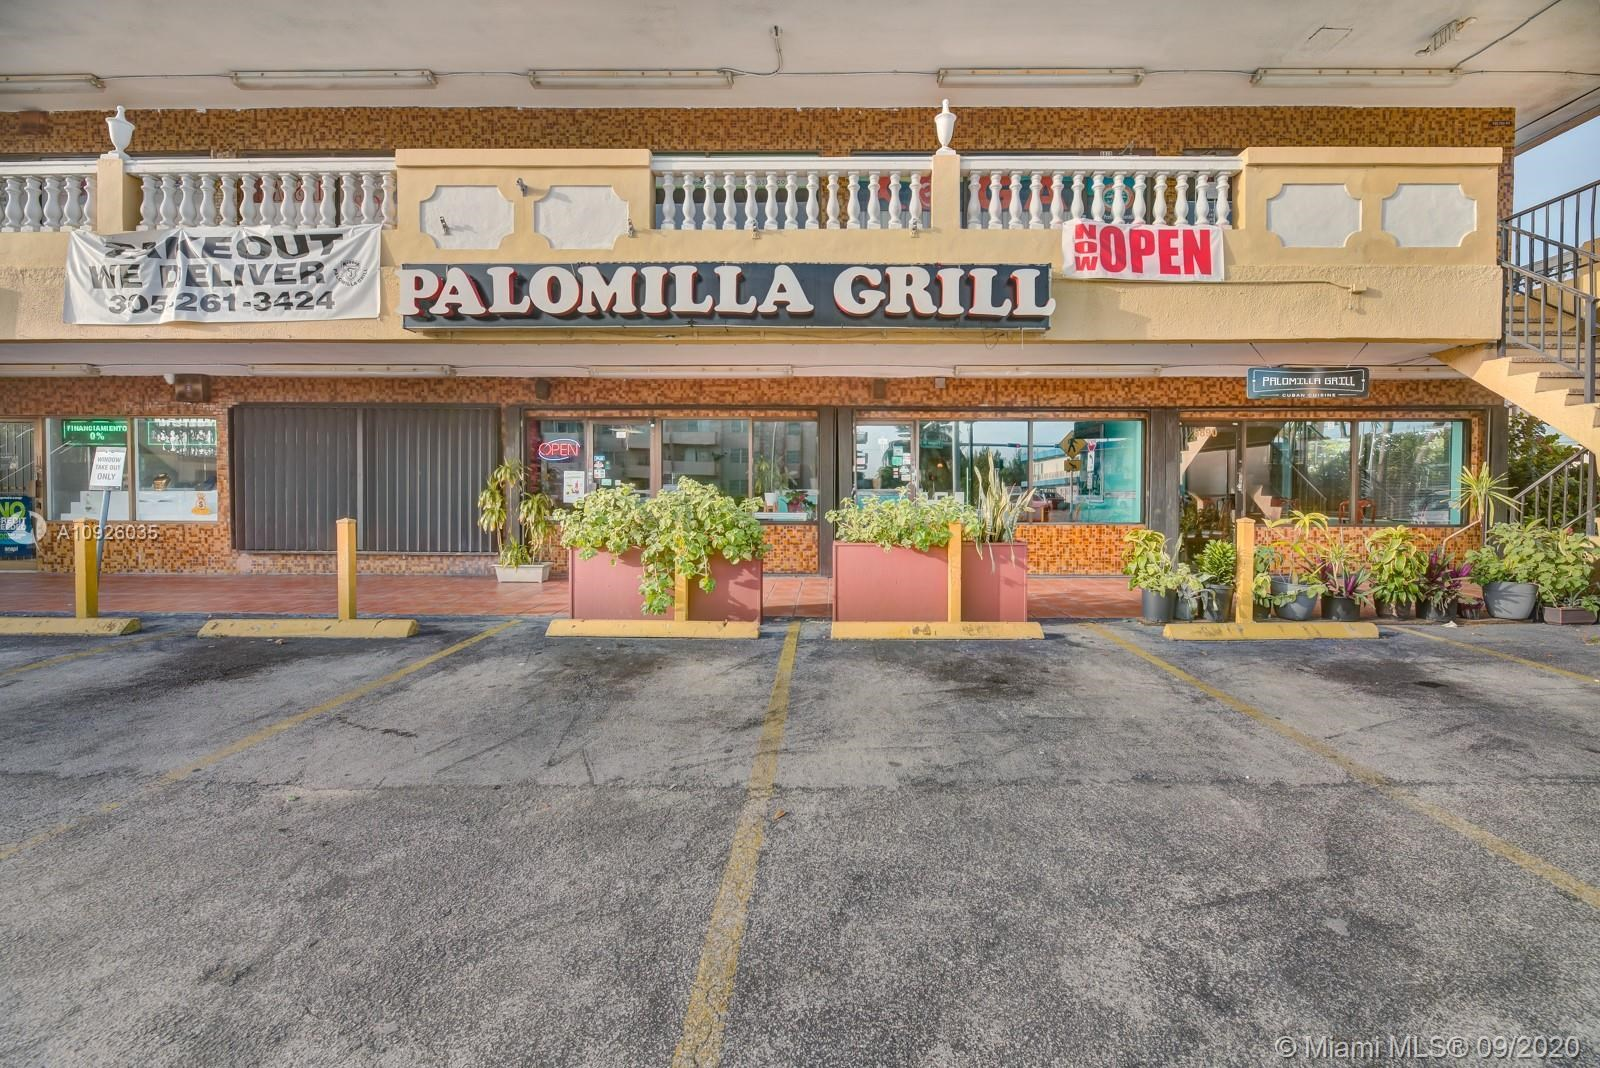 6890 W Flagler St, Miami, FL 33144